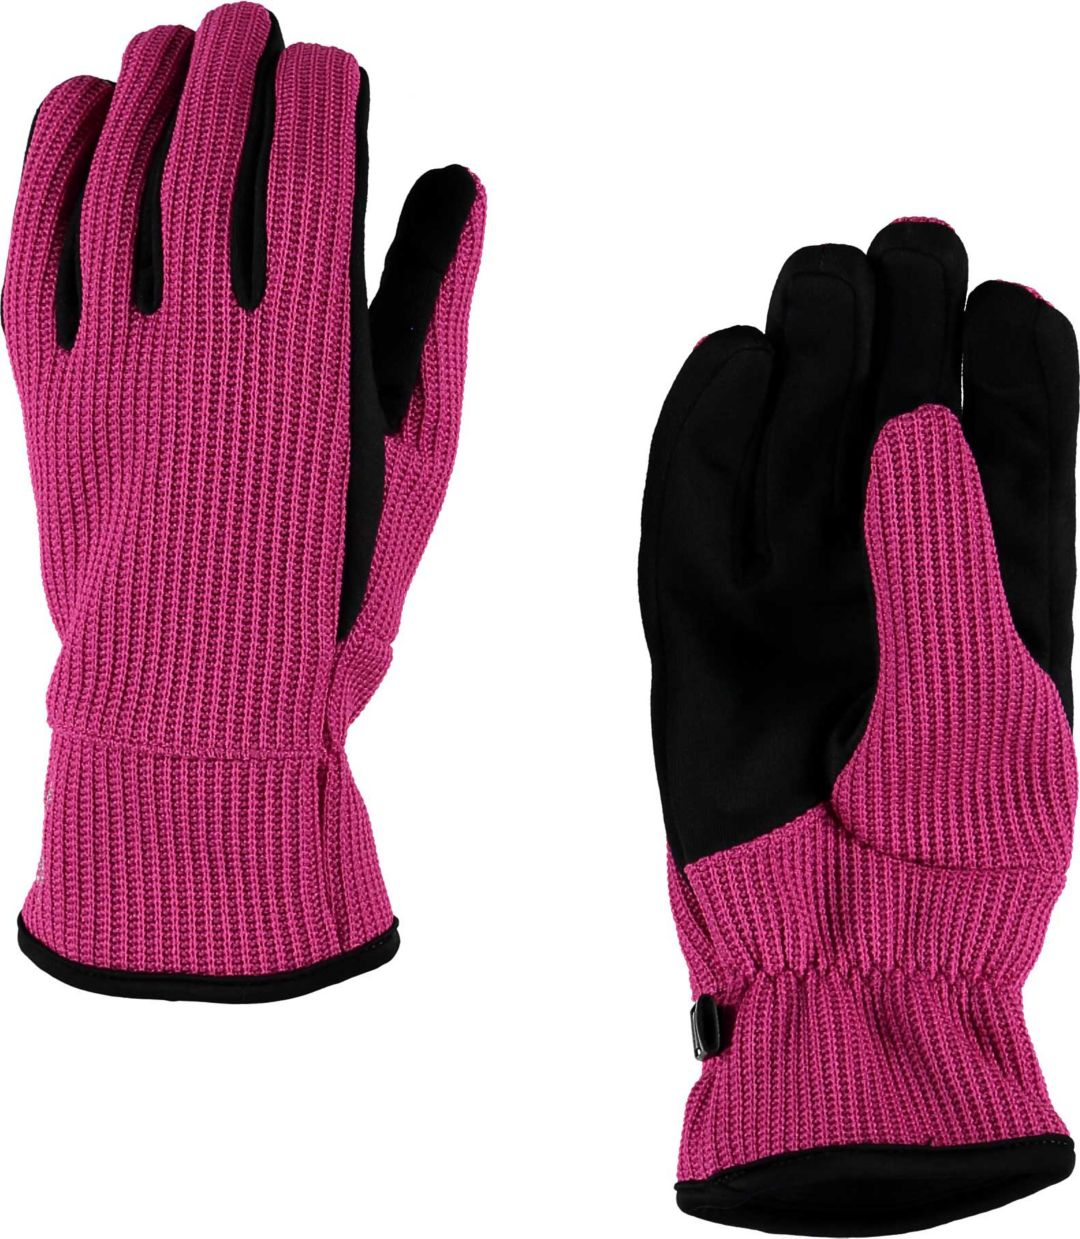 781fd97e8 Spyder Women's Core Sweater Conduct Gloves